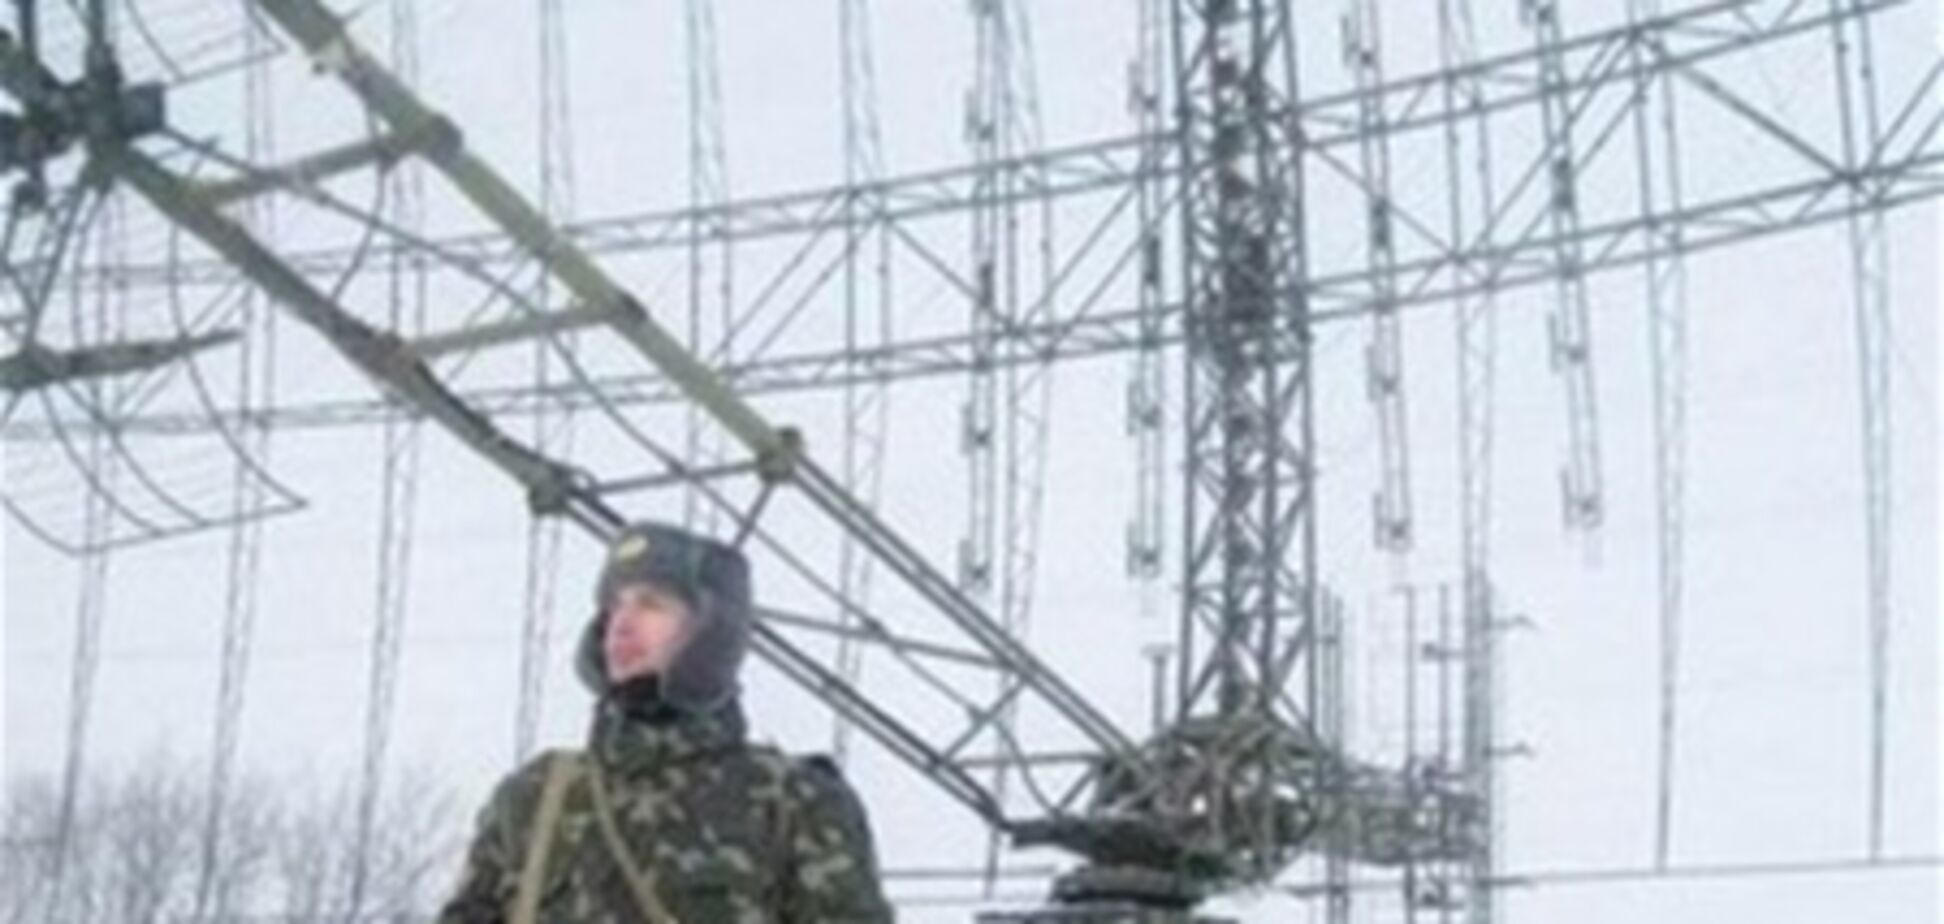 Напавшие на караул в Харькове оказались братьями